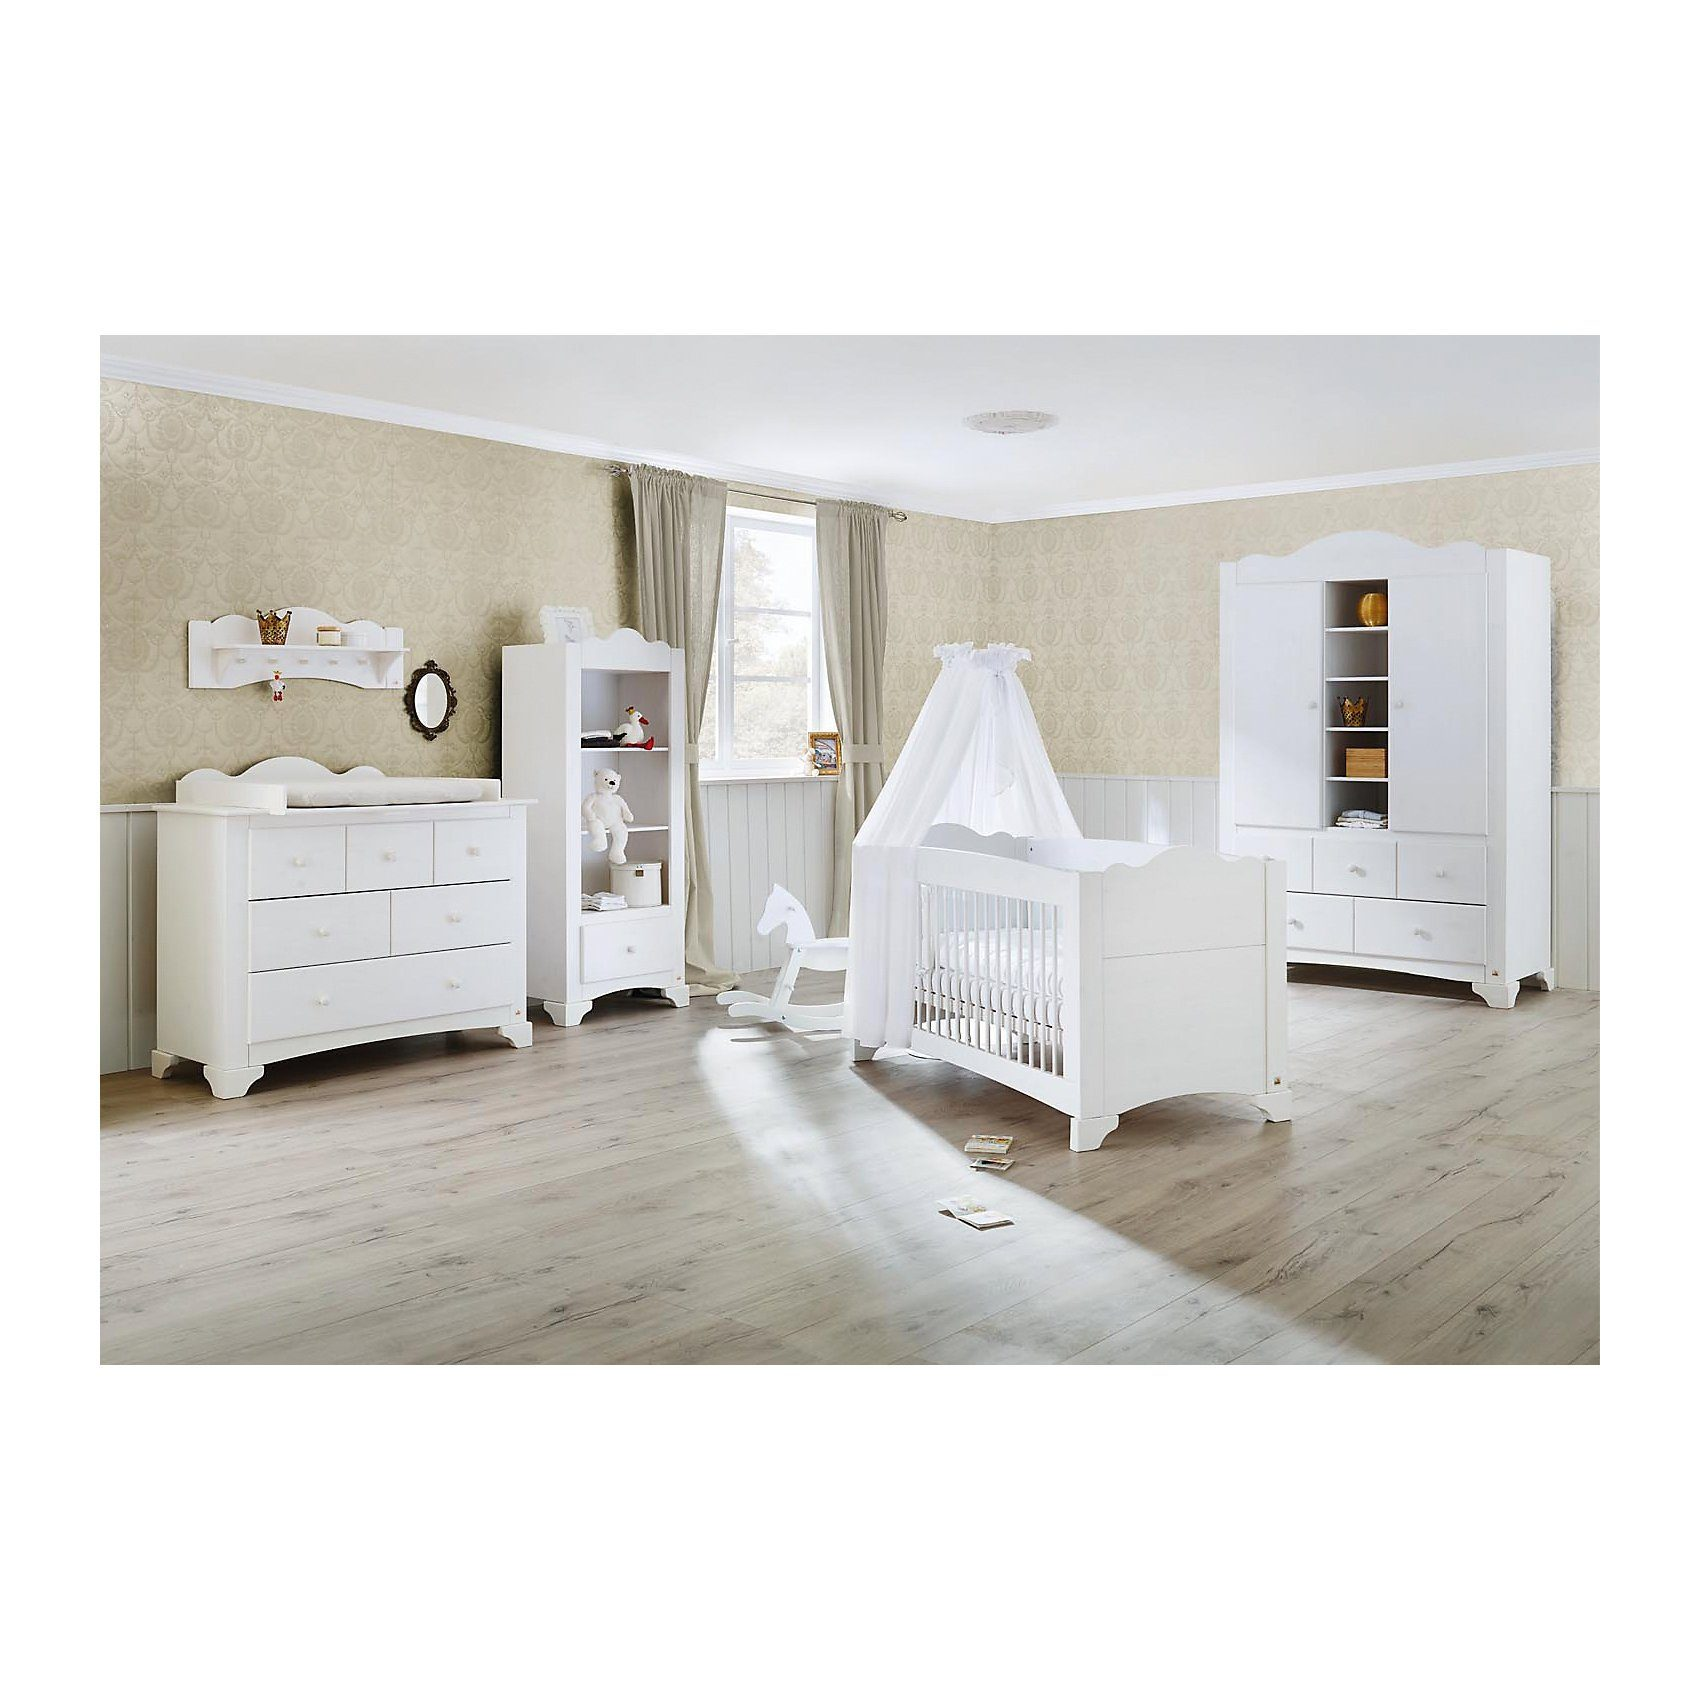 Pinolino Komplett Kinderzimmer PINO, (Kinderbett, Wickelkommode und K